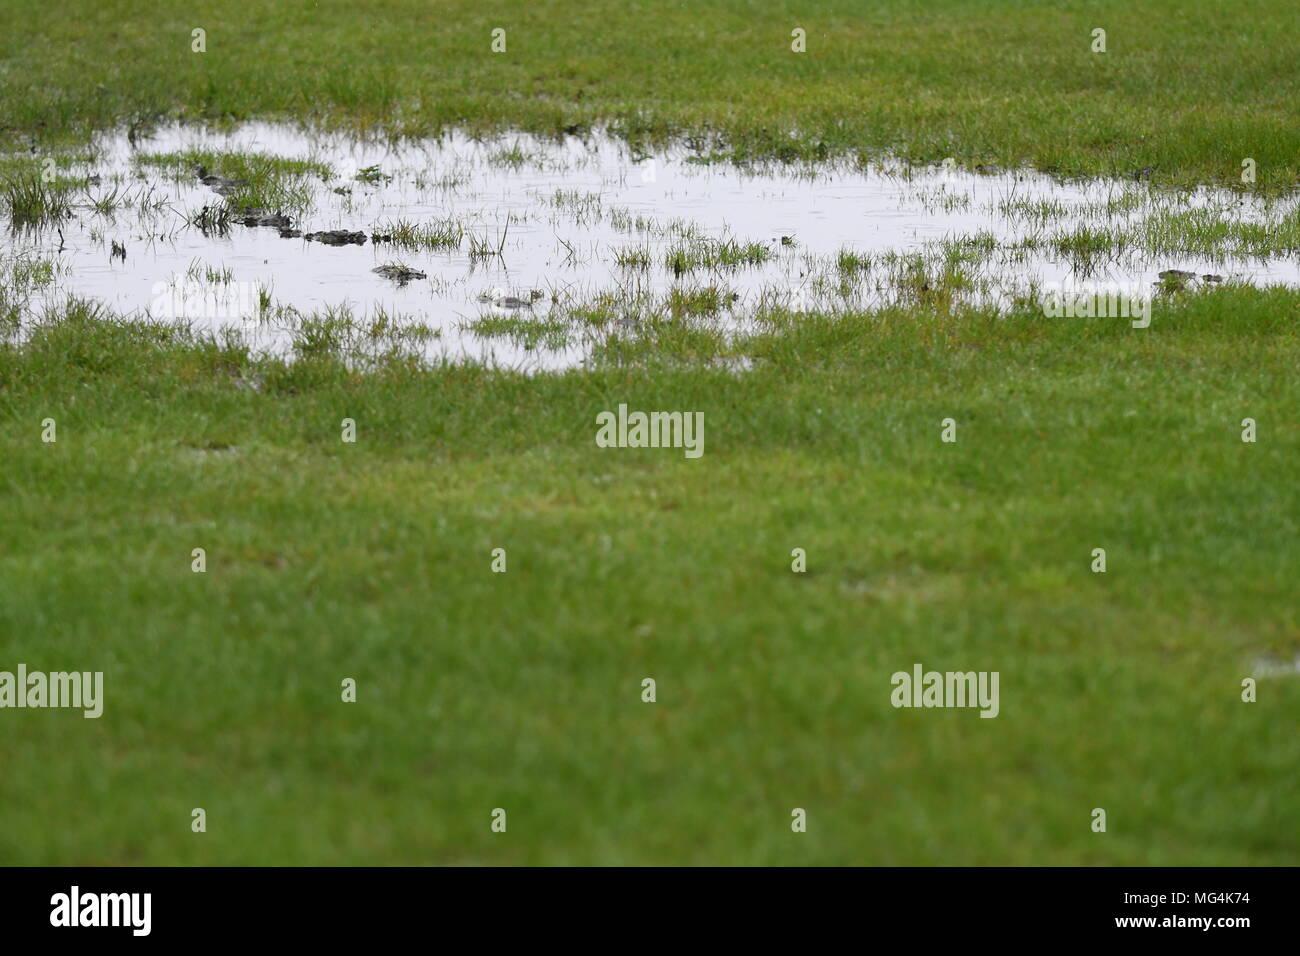 Soaking grass - Stock Image